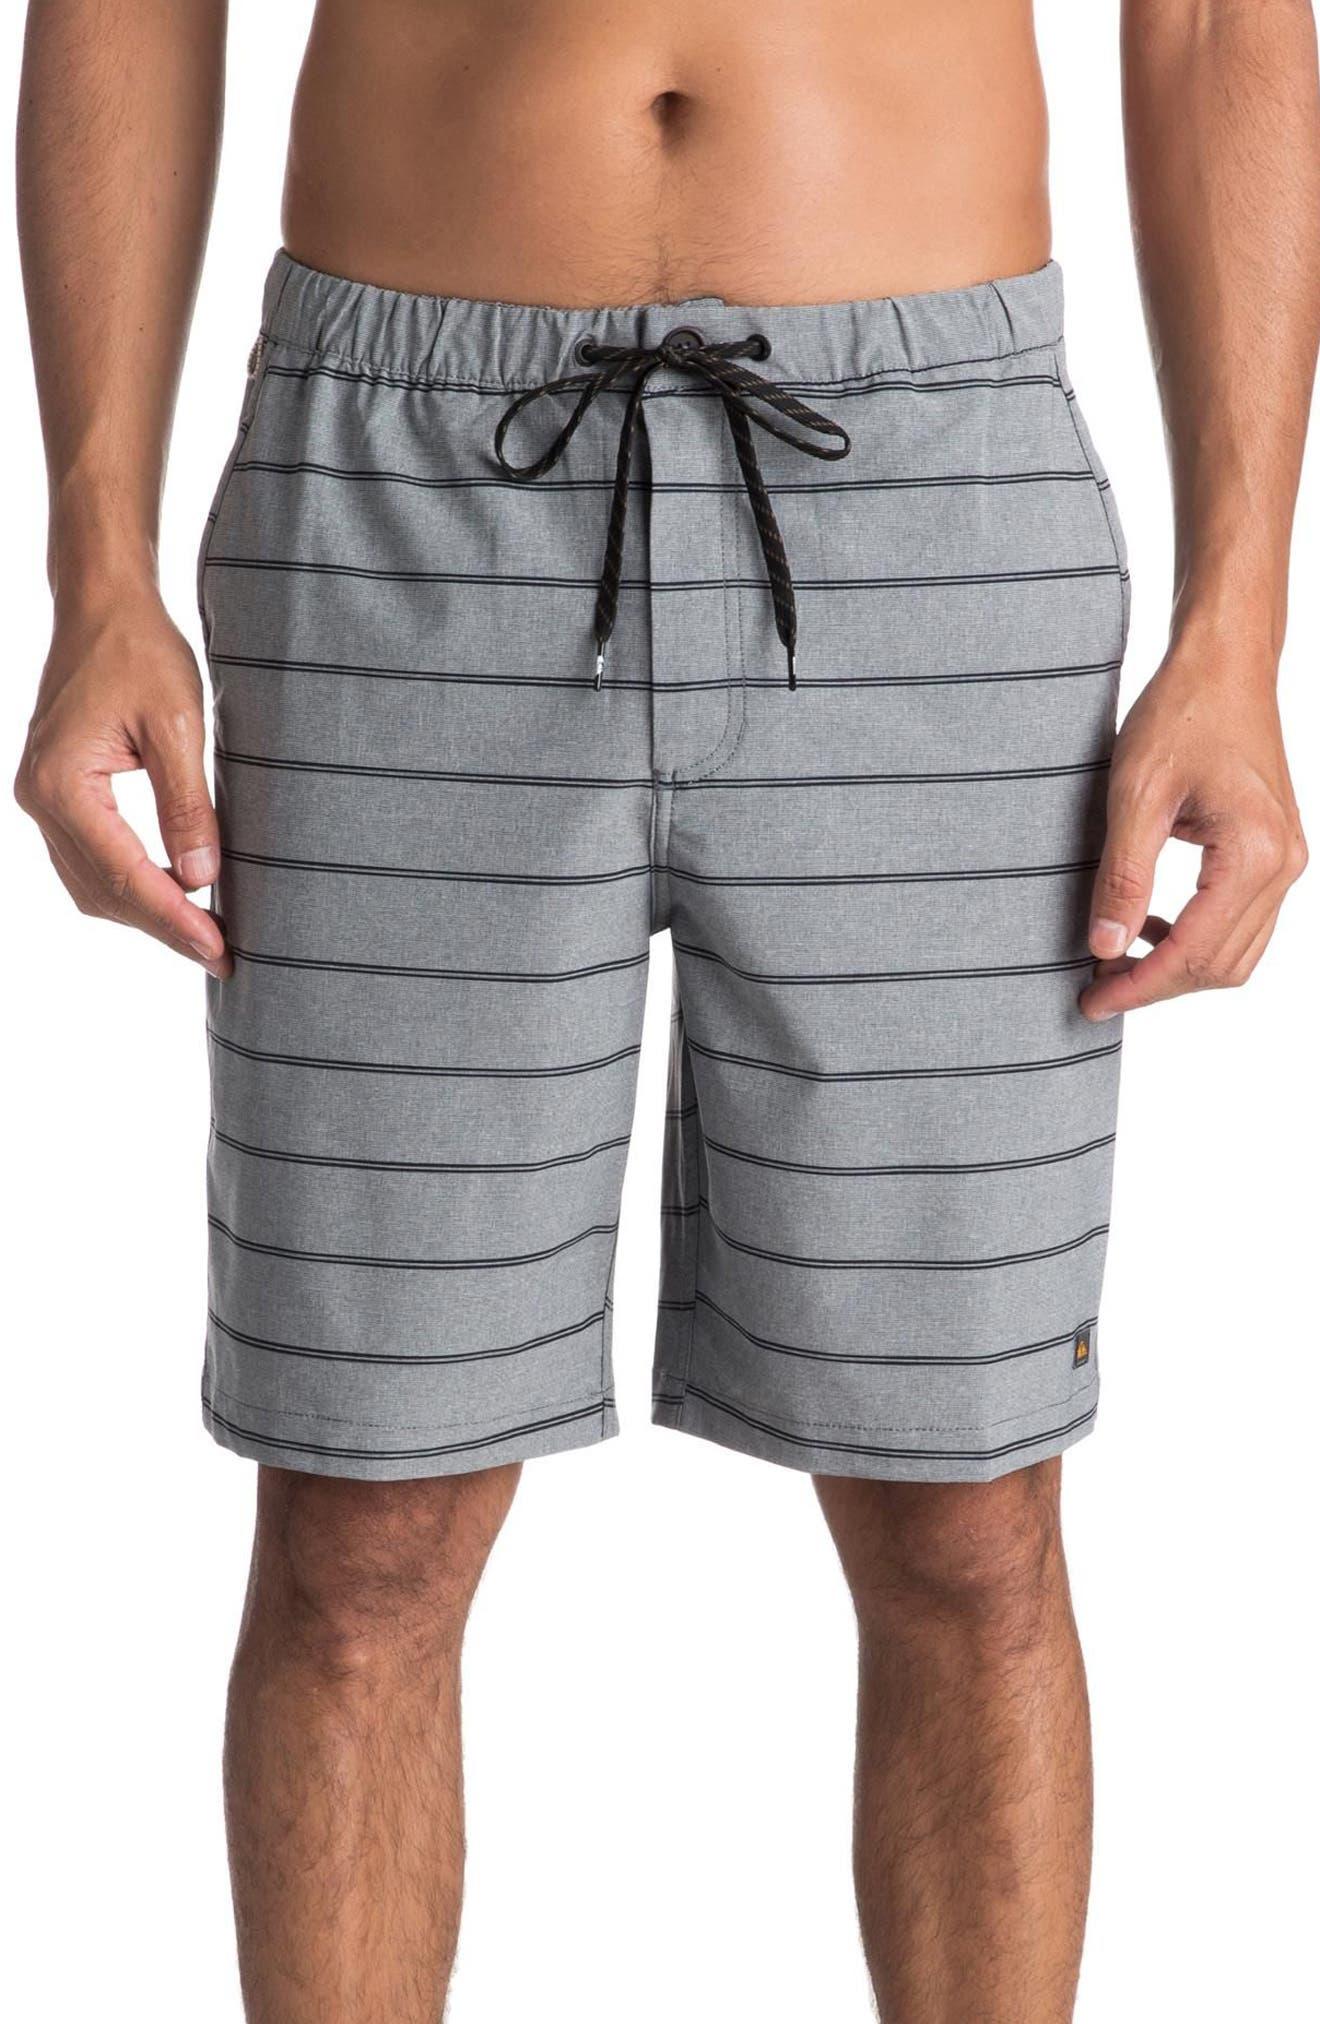 Suva Amphibian Shorts,                         Main,                         color, Black